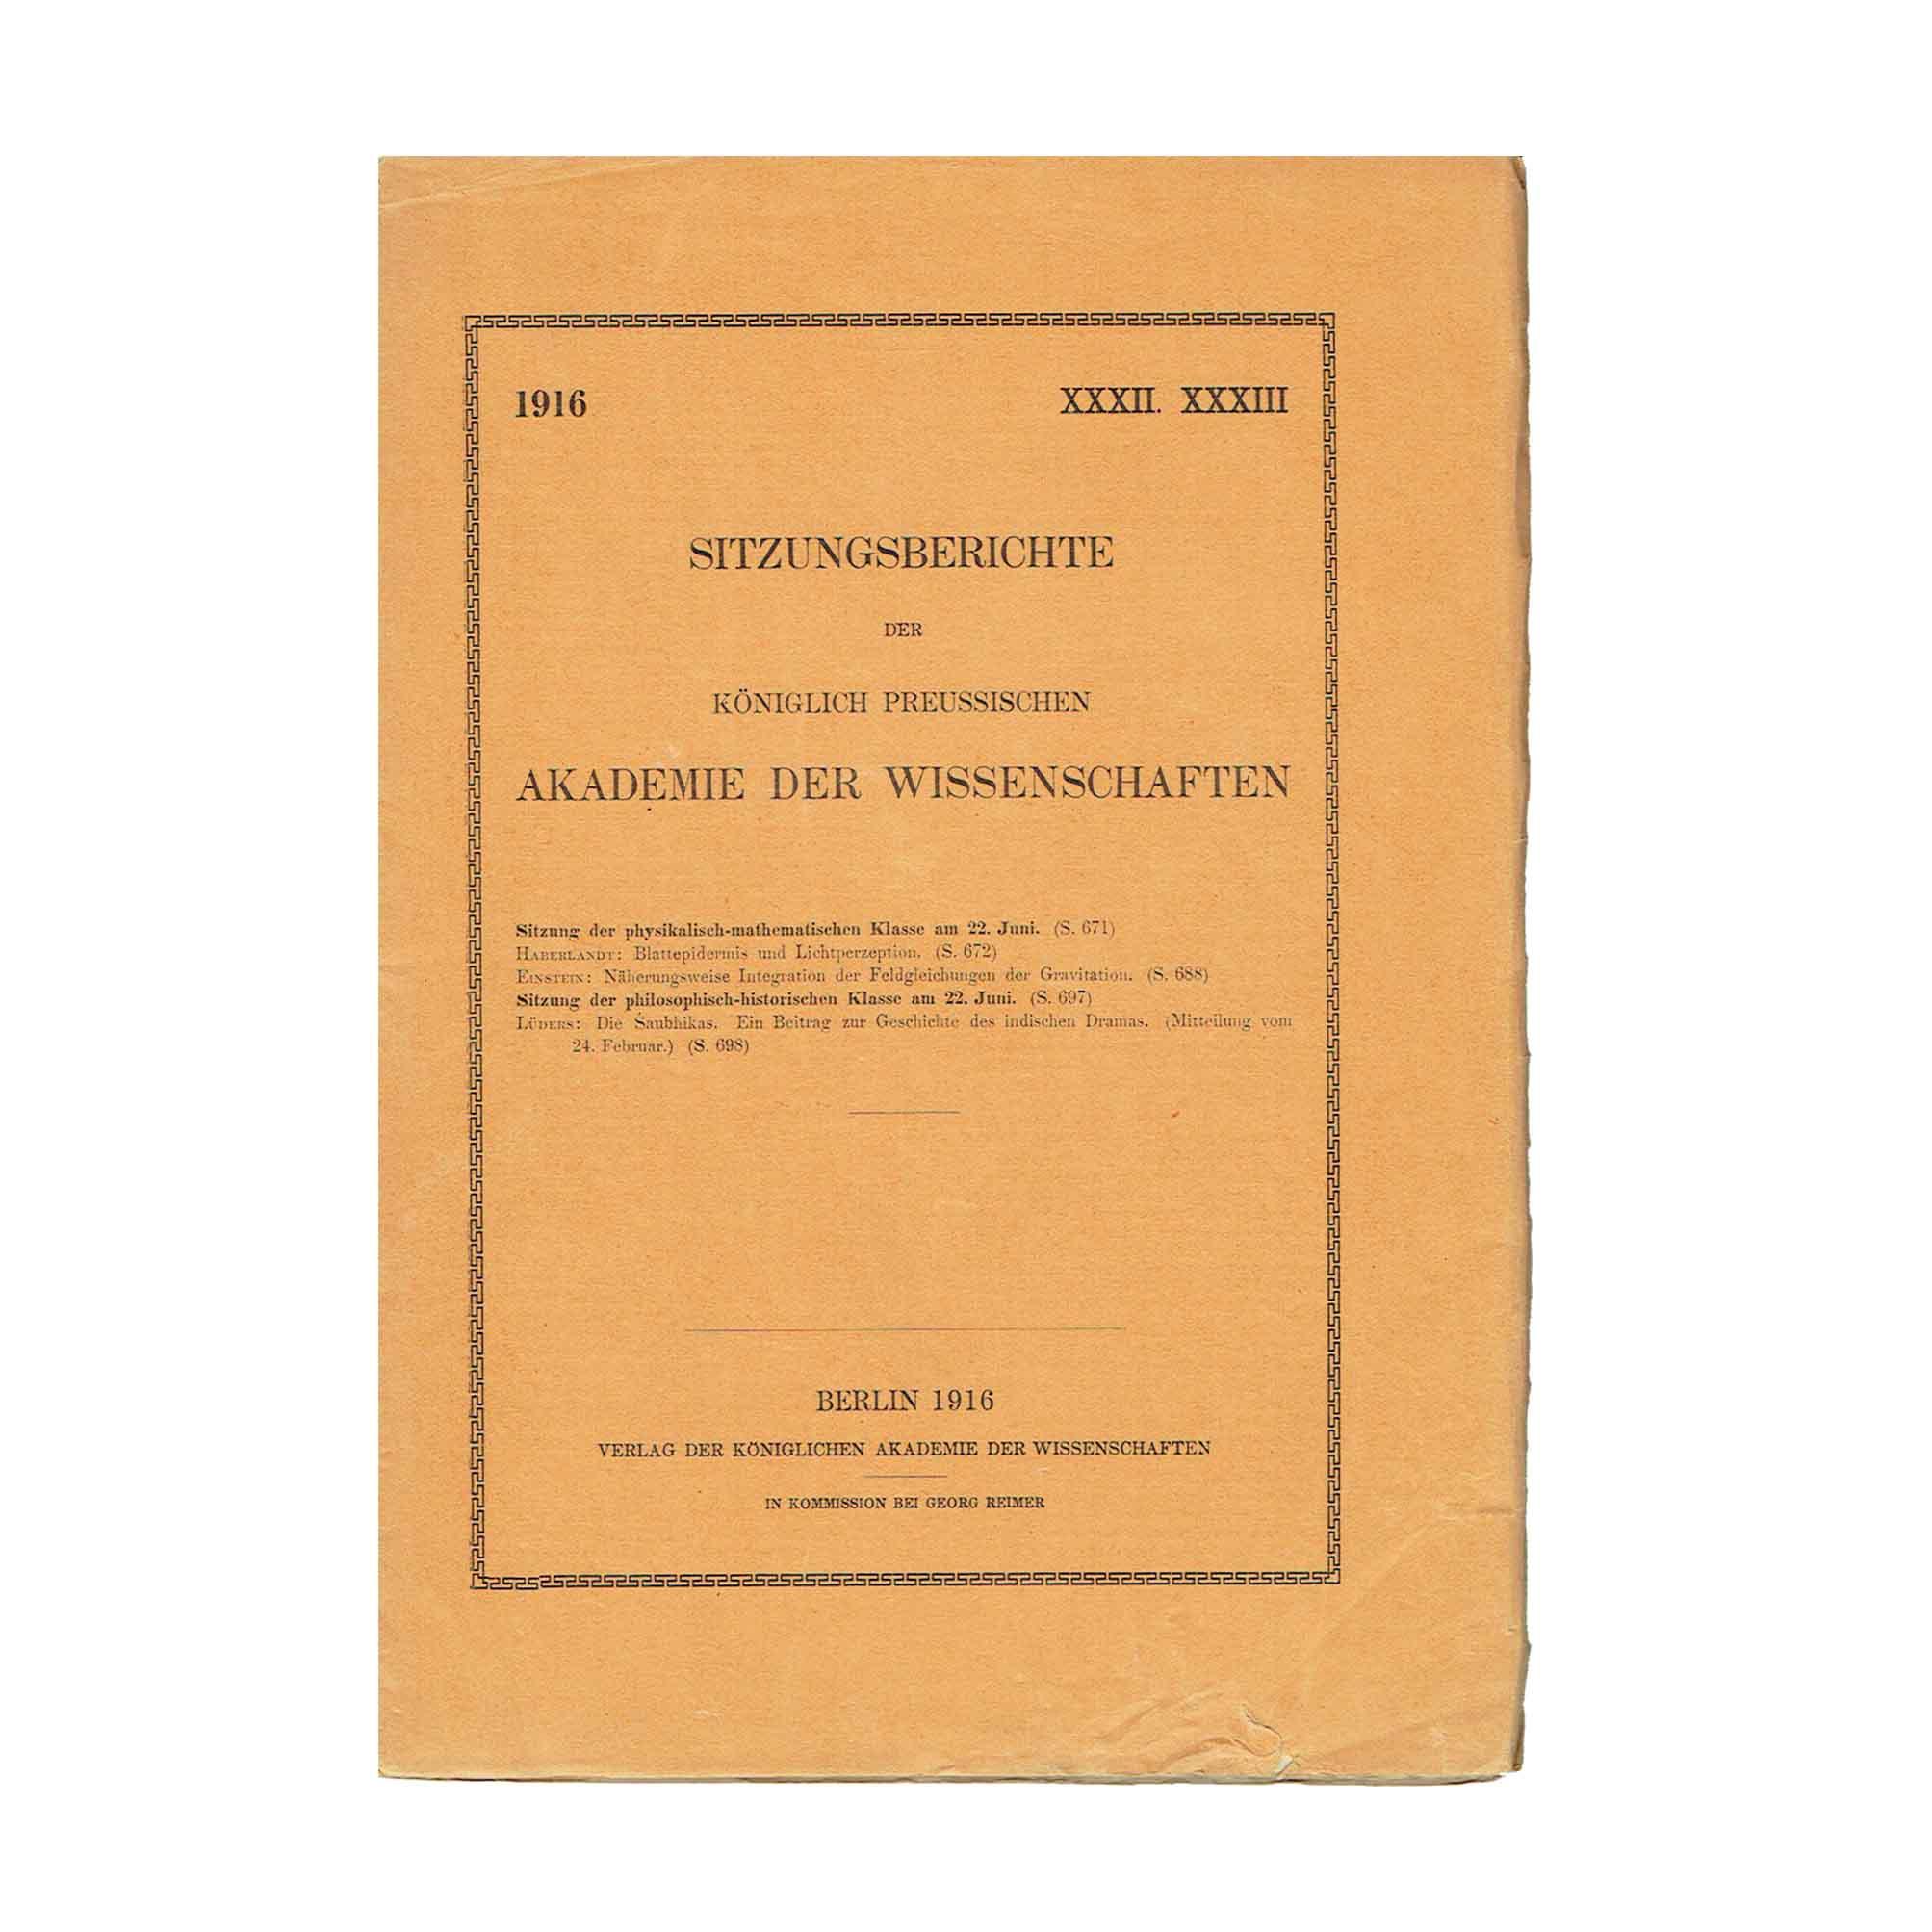 5714-Einstein-Field-Equations-of-Gravitation-Akademie-XXXIII-1916-Cover-recto-freeN.jpg